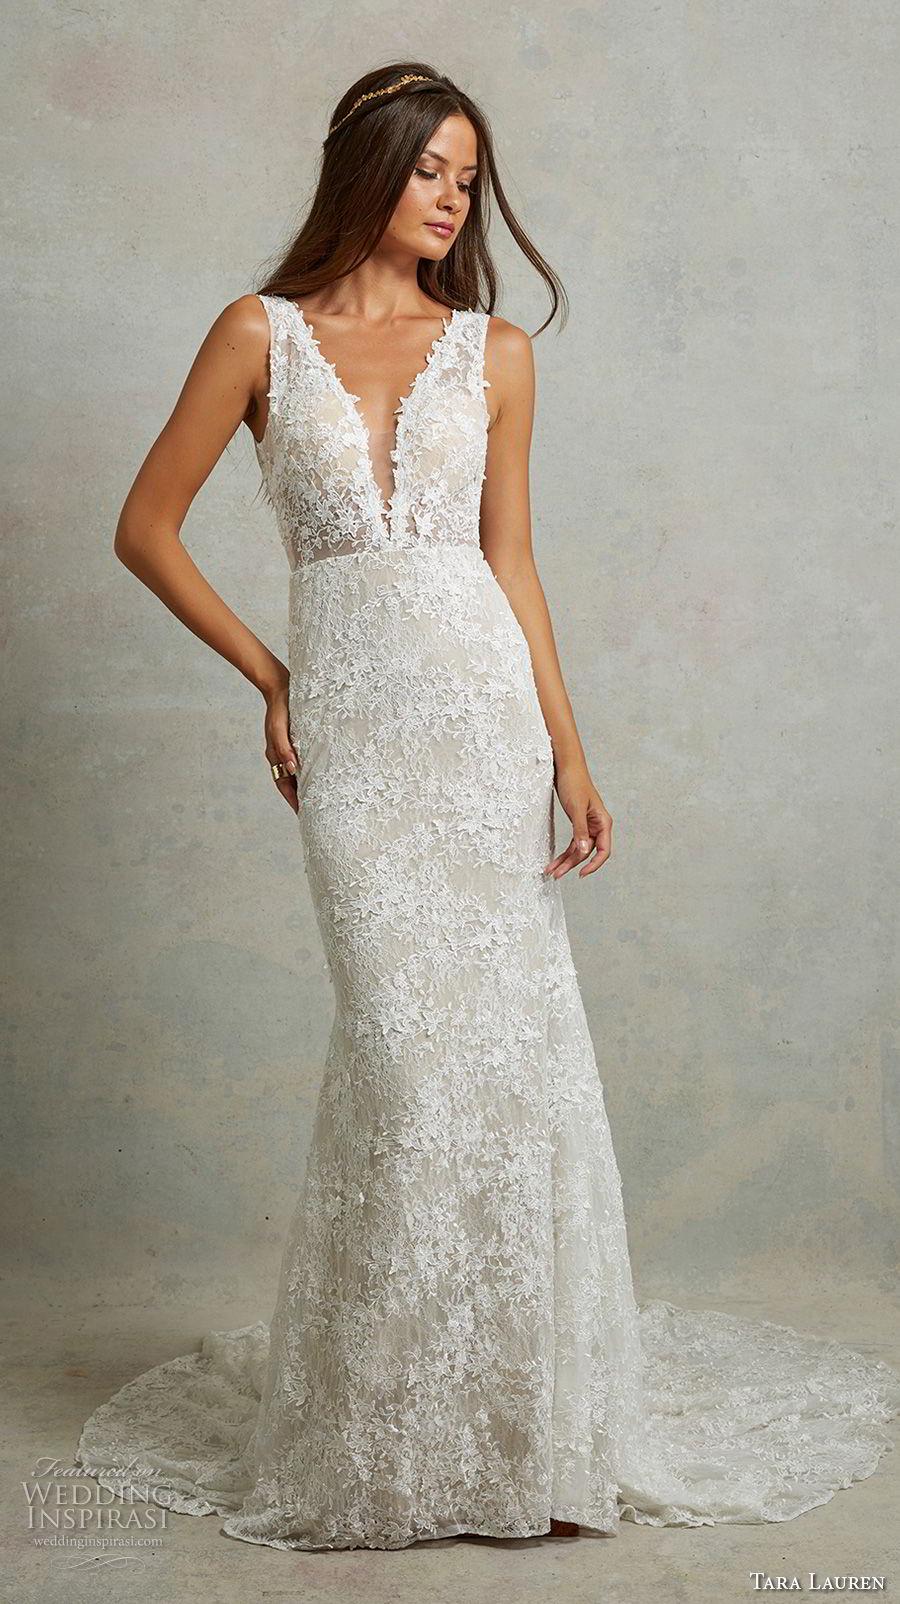 tara lauren spring 2018 bridal sleeveless deep v neck full embellishment elegant sheath wedding dress v back medium train (6) mv